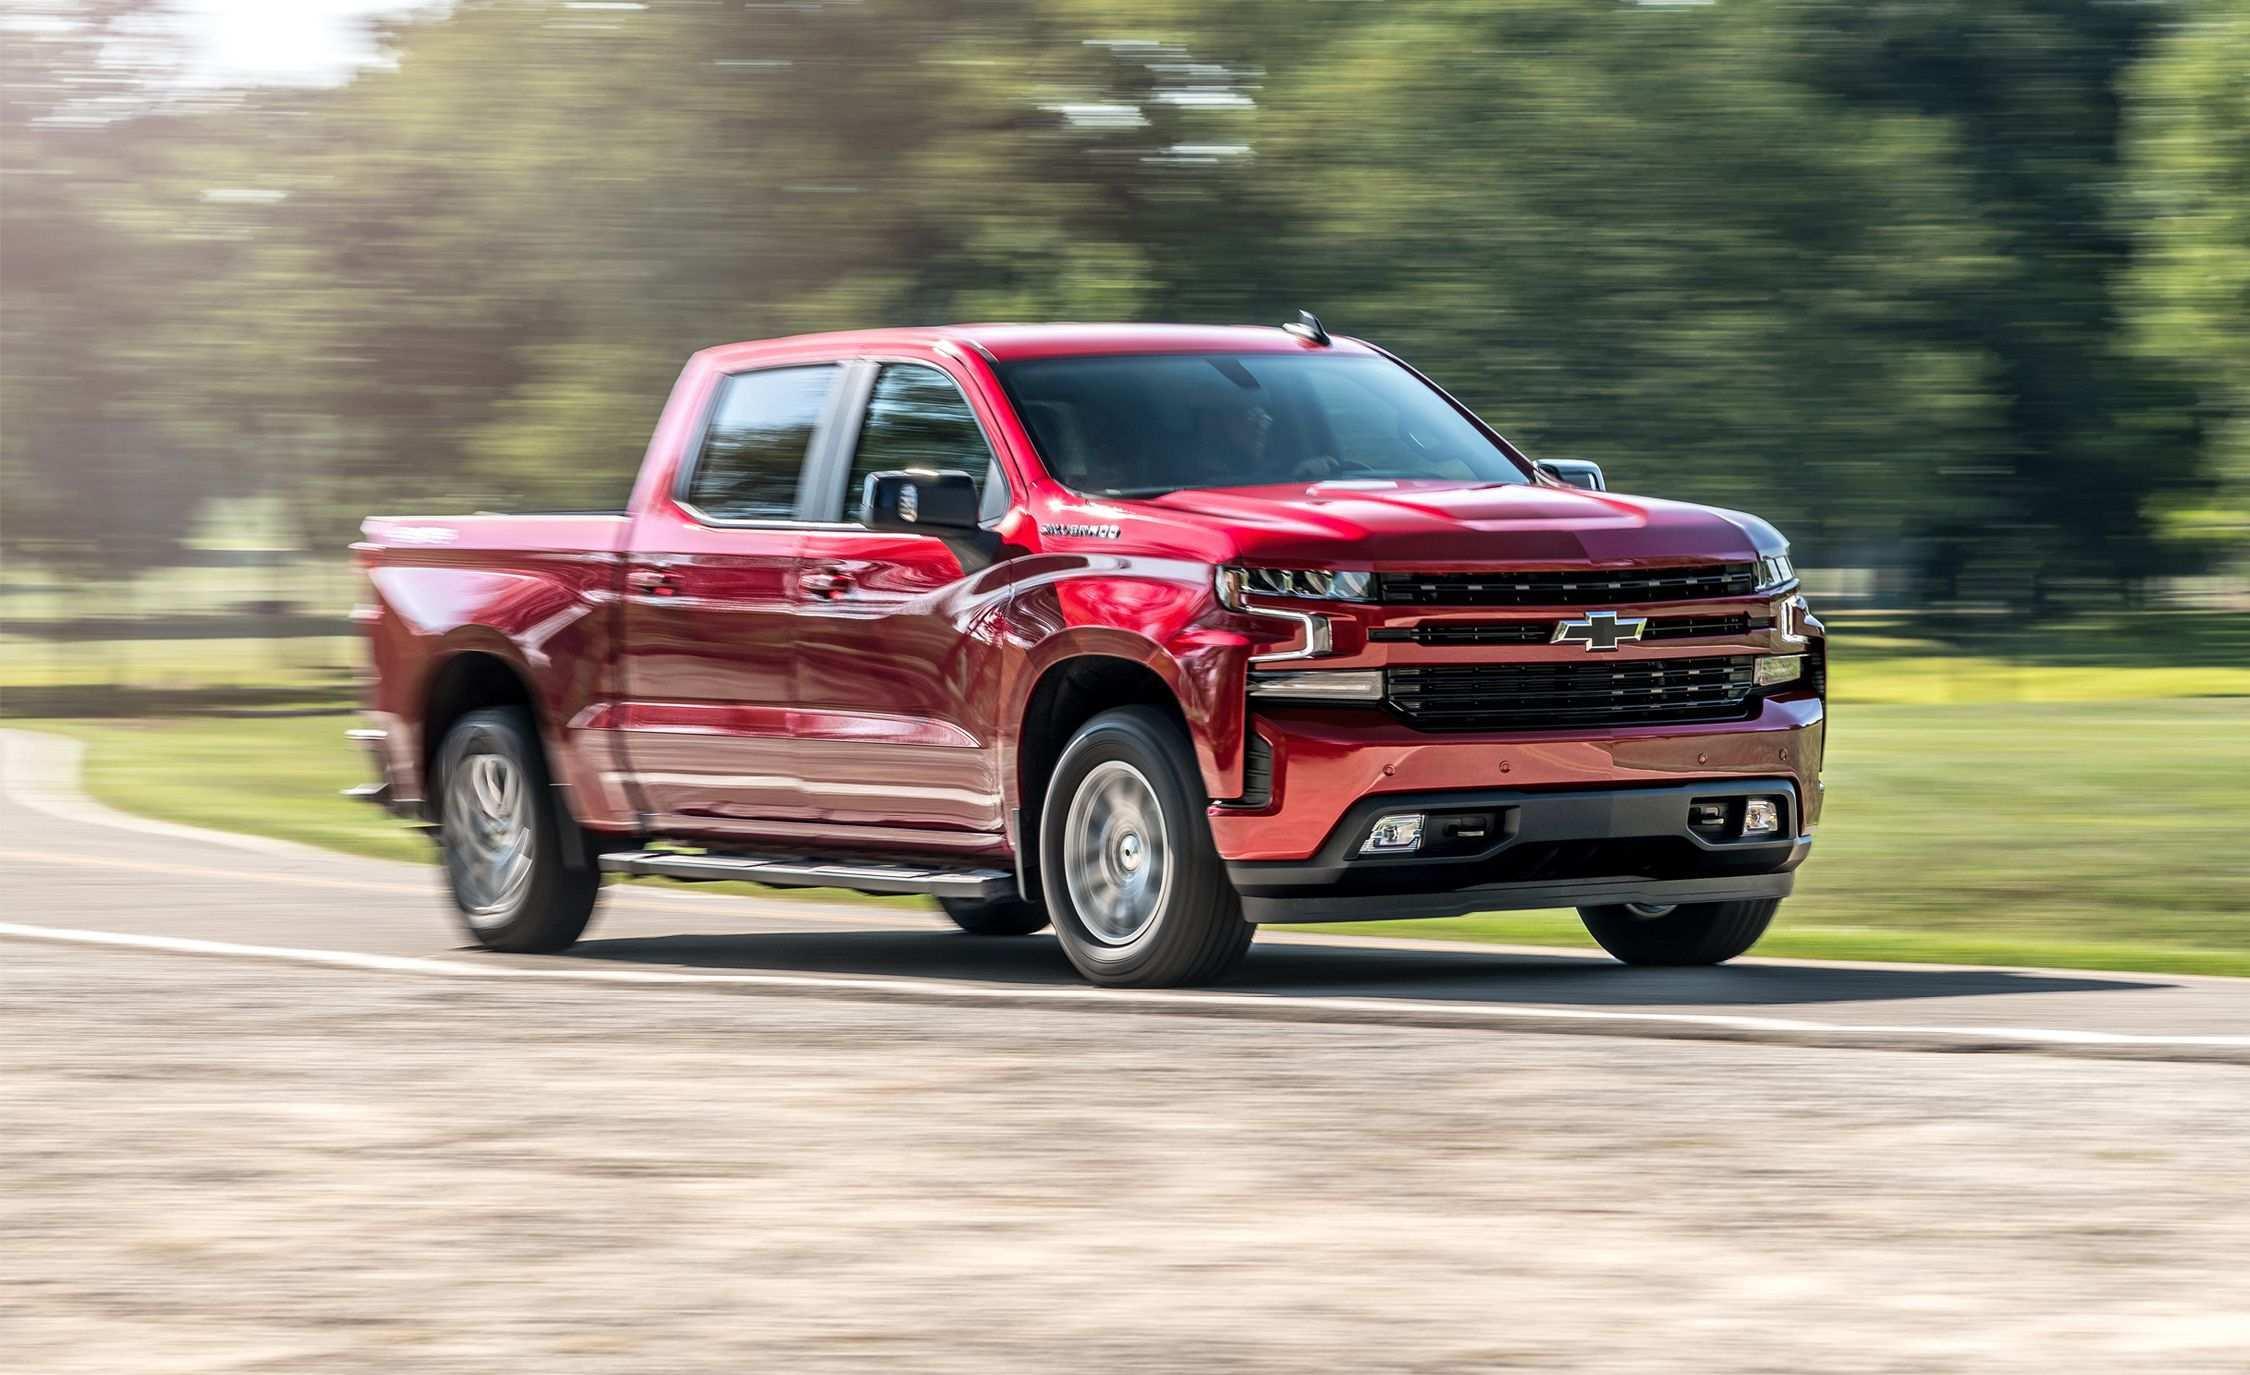 70 Concept of 2019 Chevrolet Silverado Release Date Rumors for 2019 Chevrolet Silverado Release Date